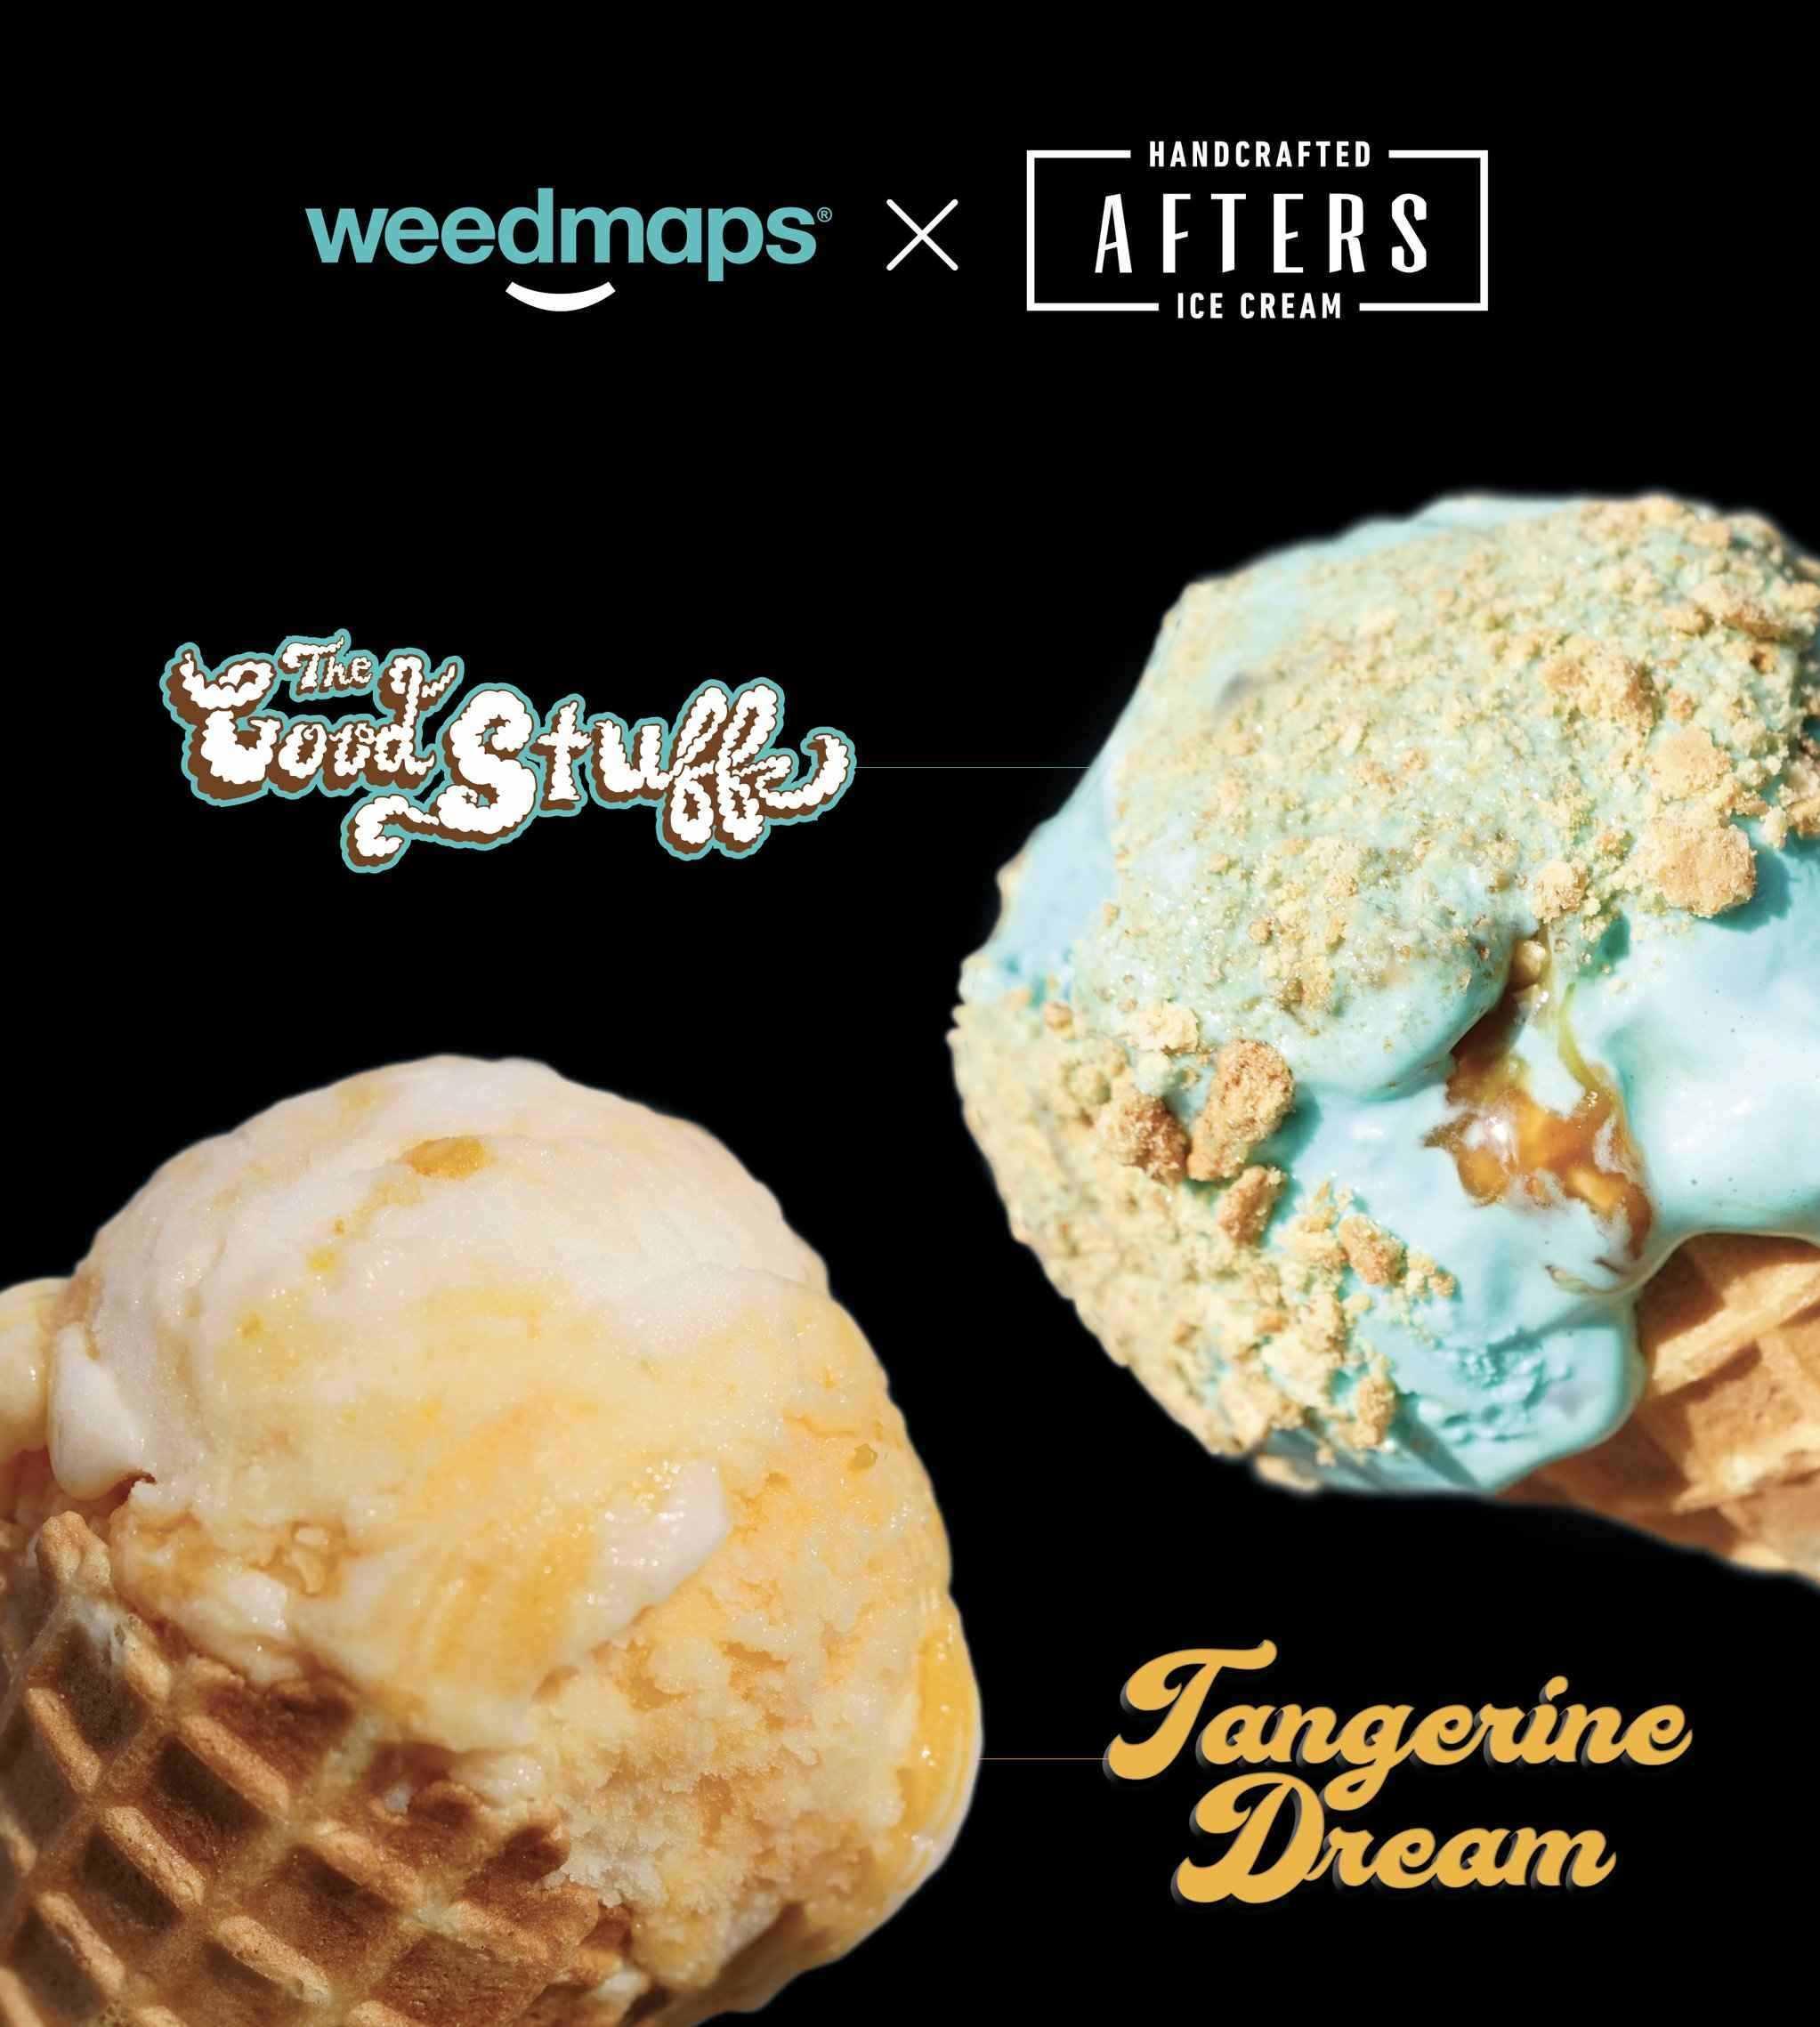 Afters Ice Cream x Weedmaps